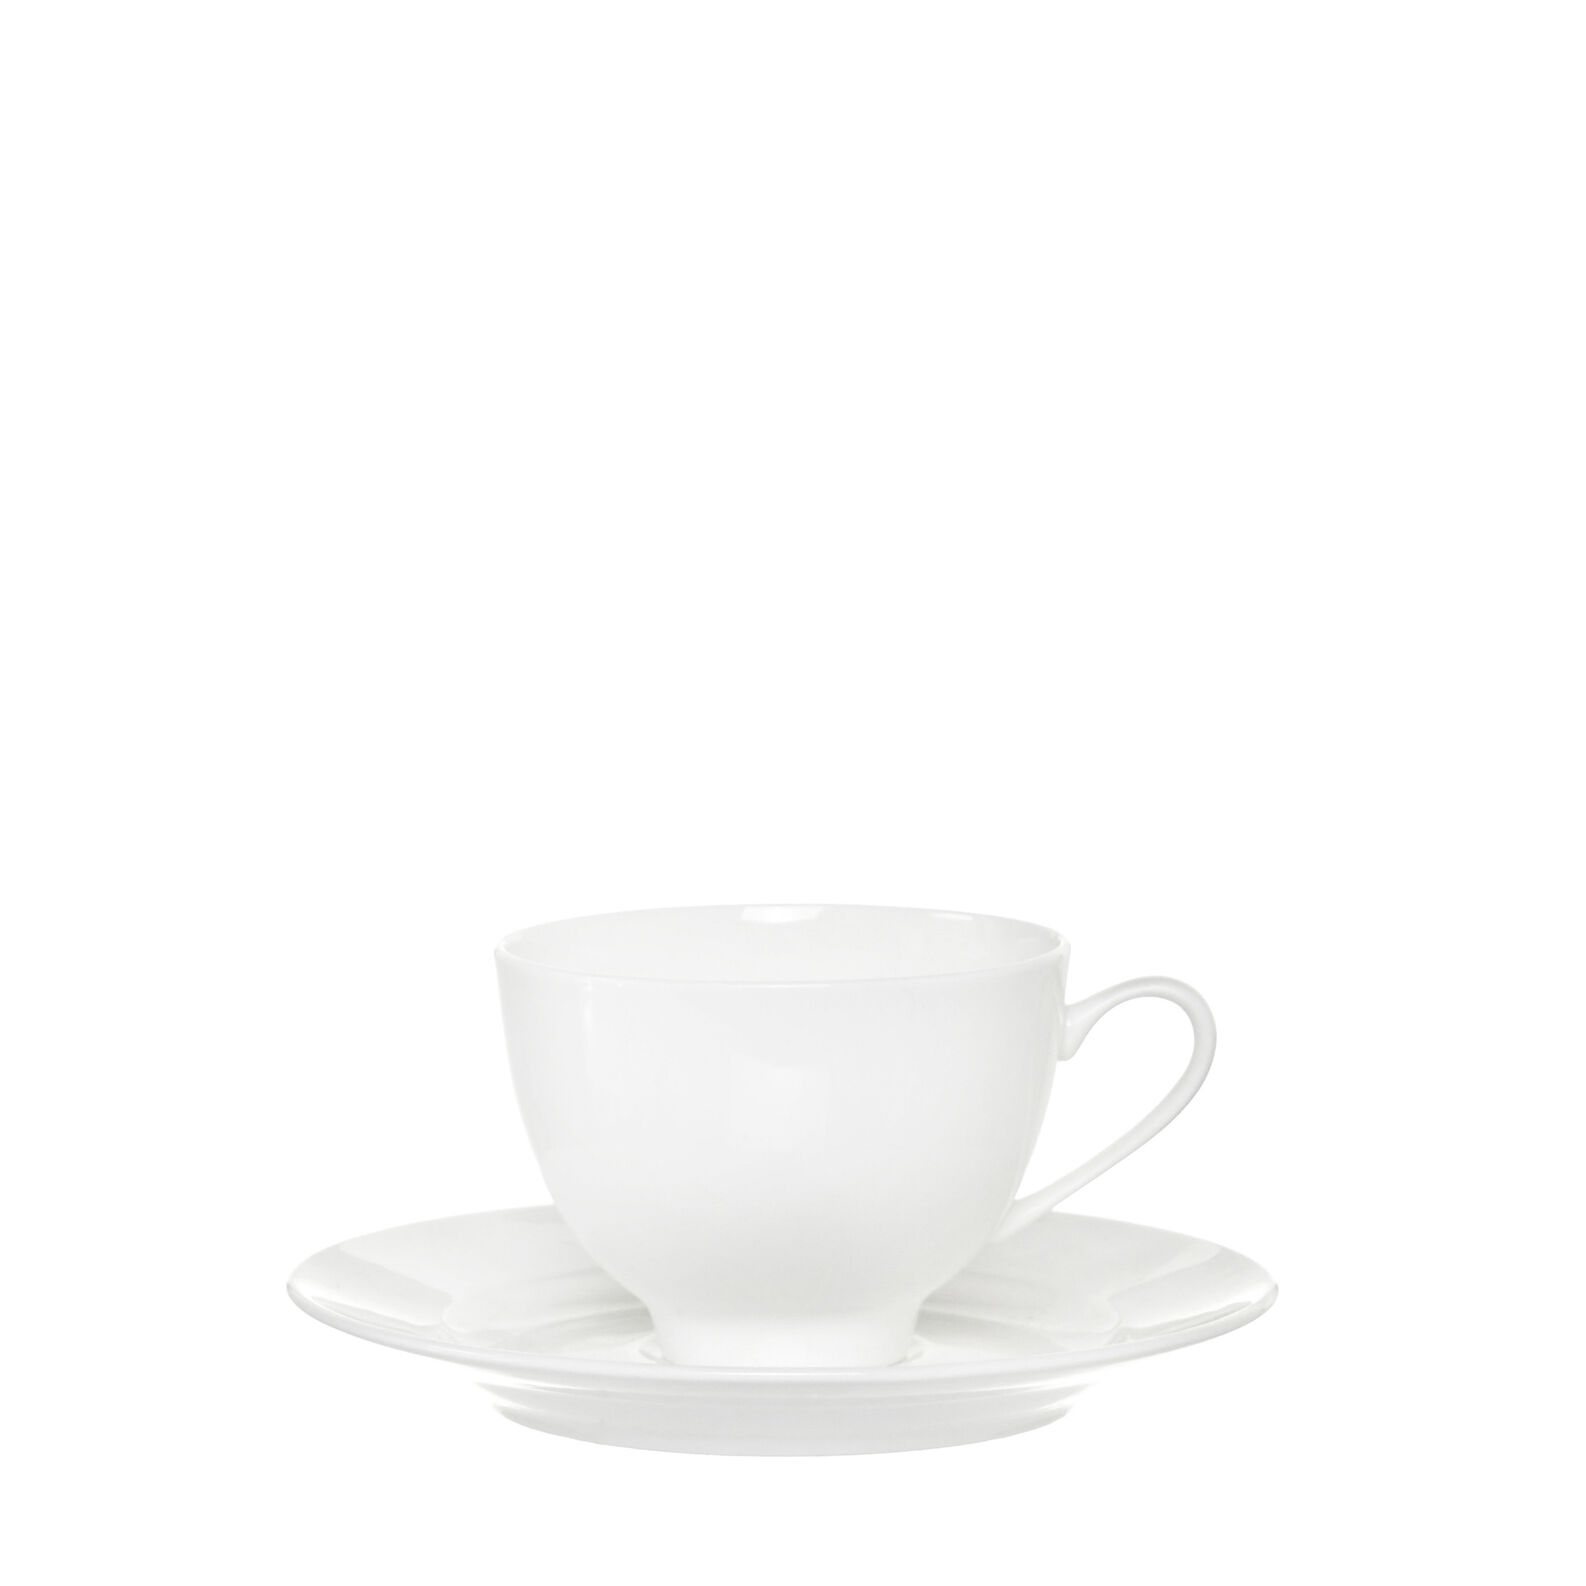 Veronica tea cup